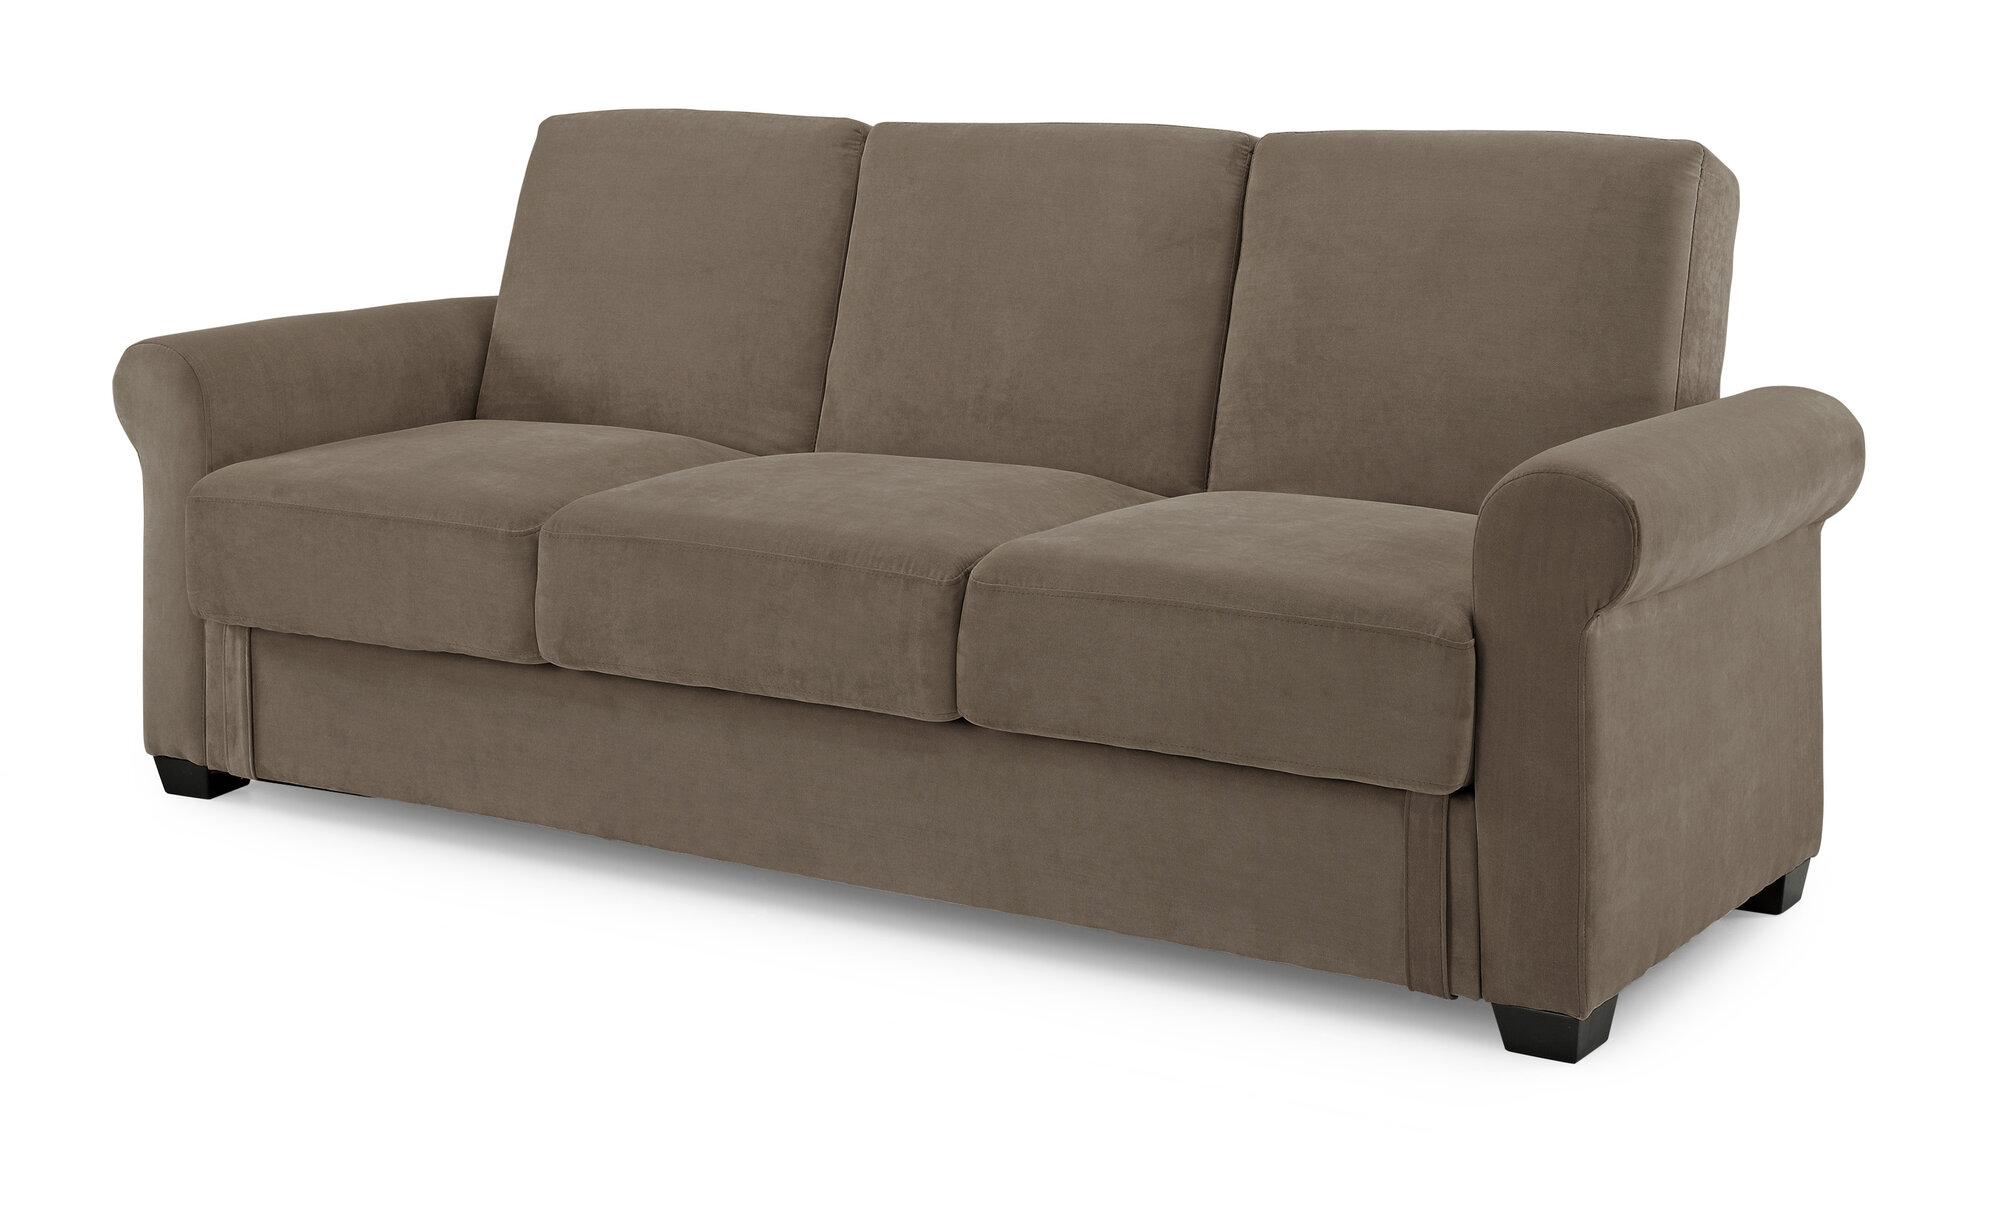 Lifestyle Solutions Serta Dream Thomas Sleeper Sofa Ebay